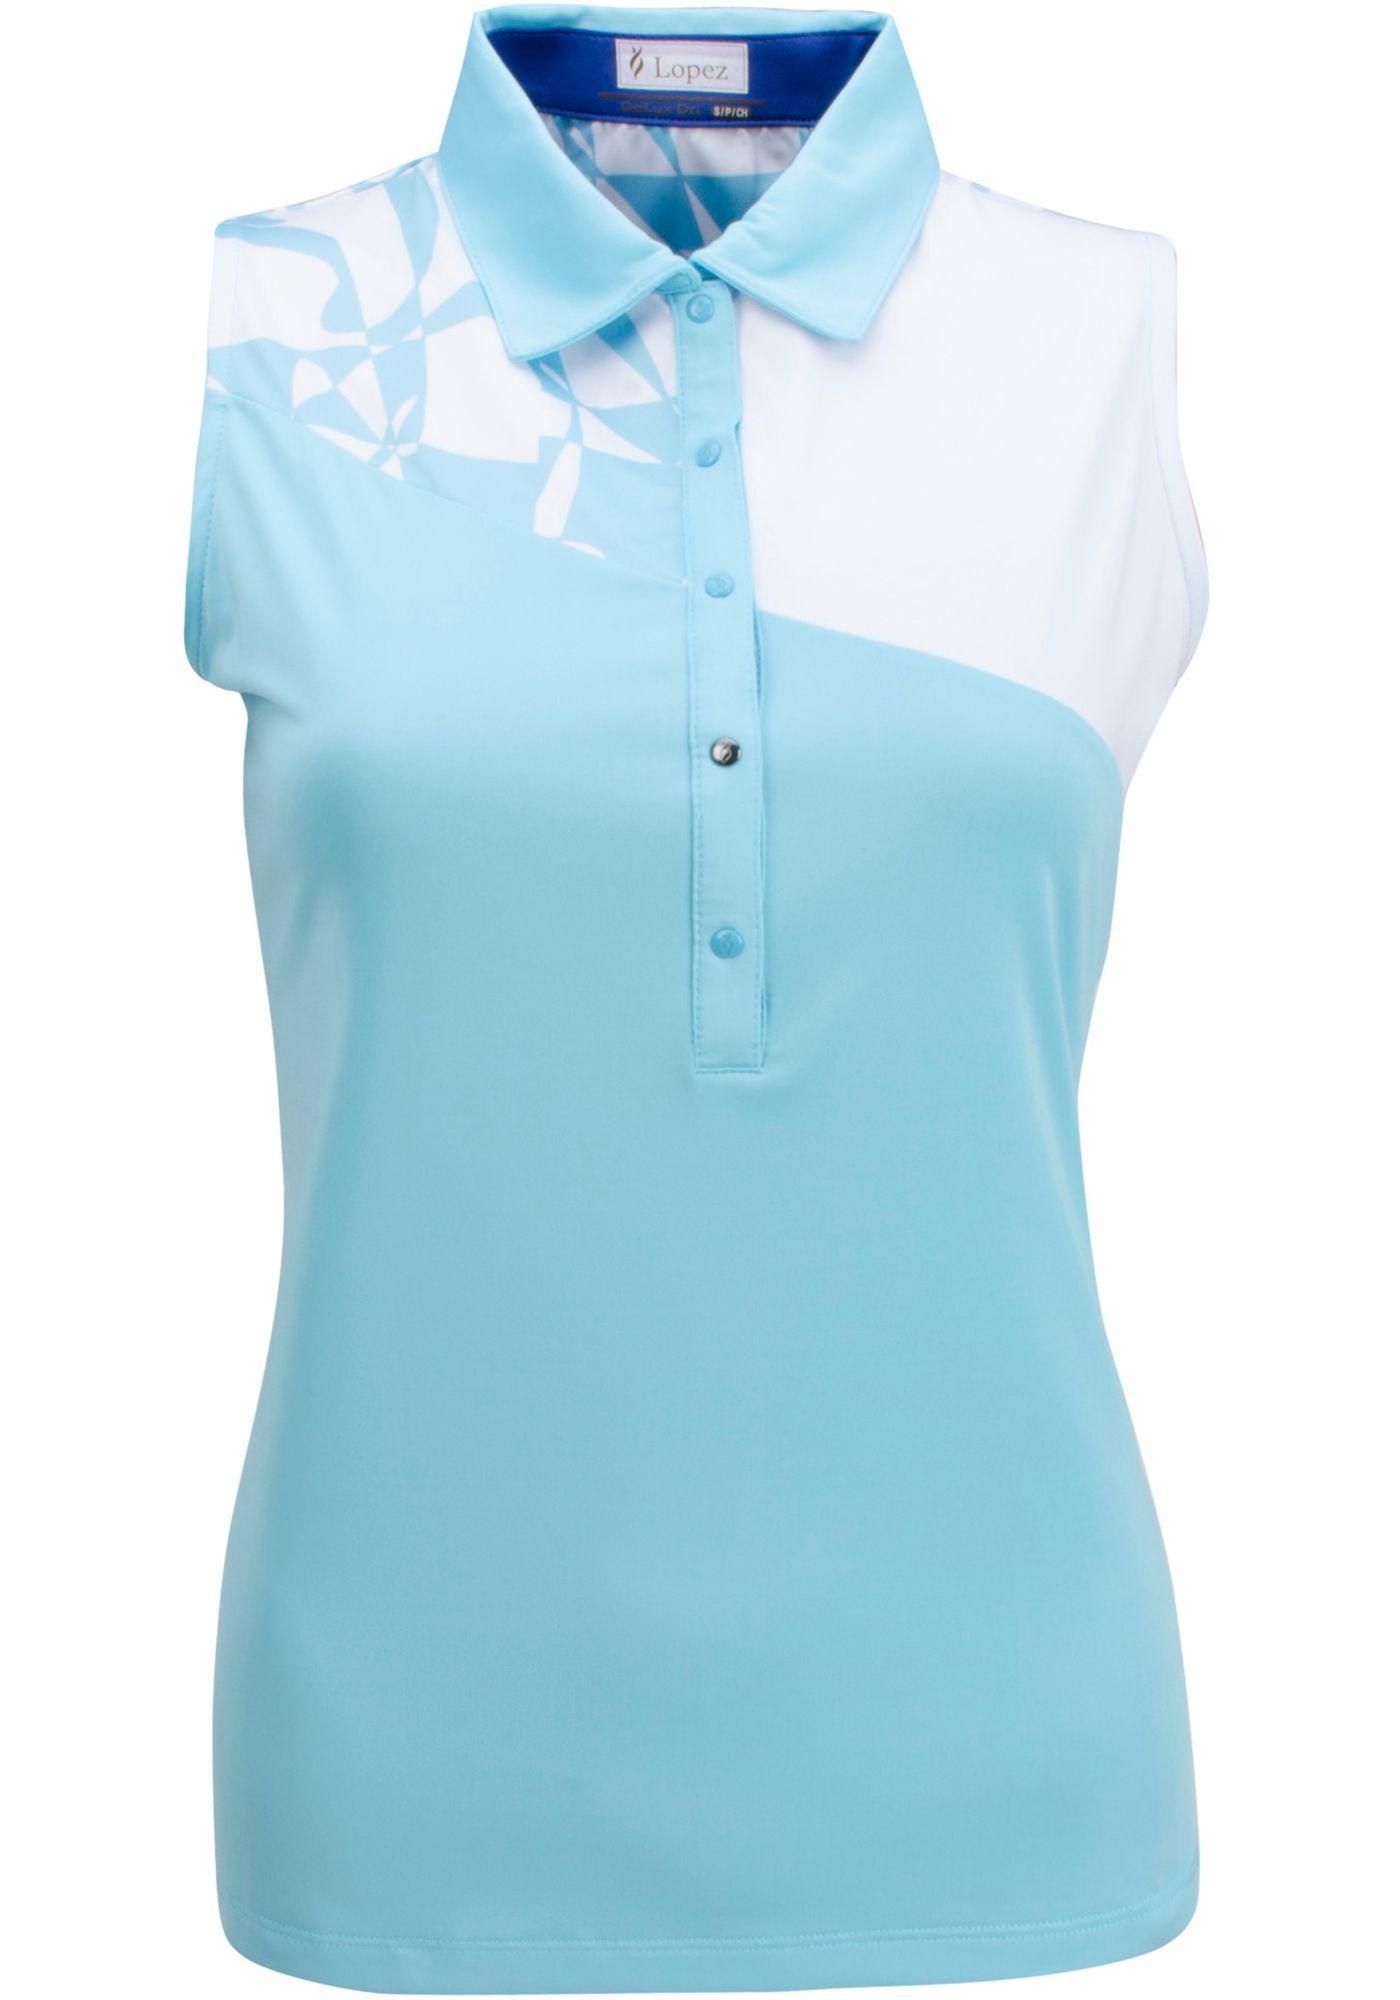 Nancy Lopez Women's Splice Sleeveless Golf Polo